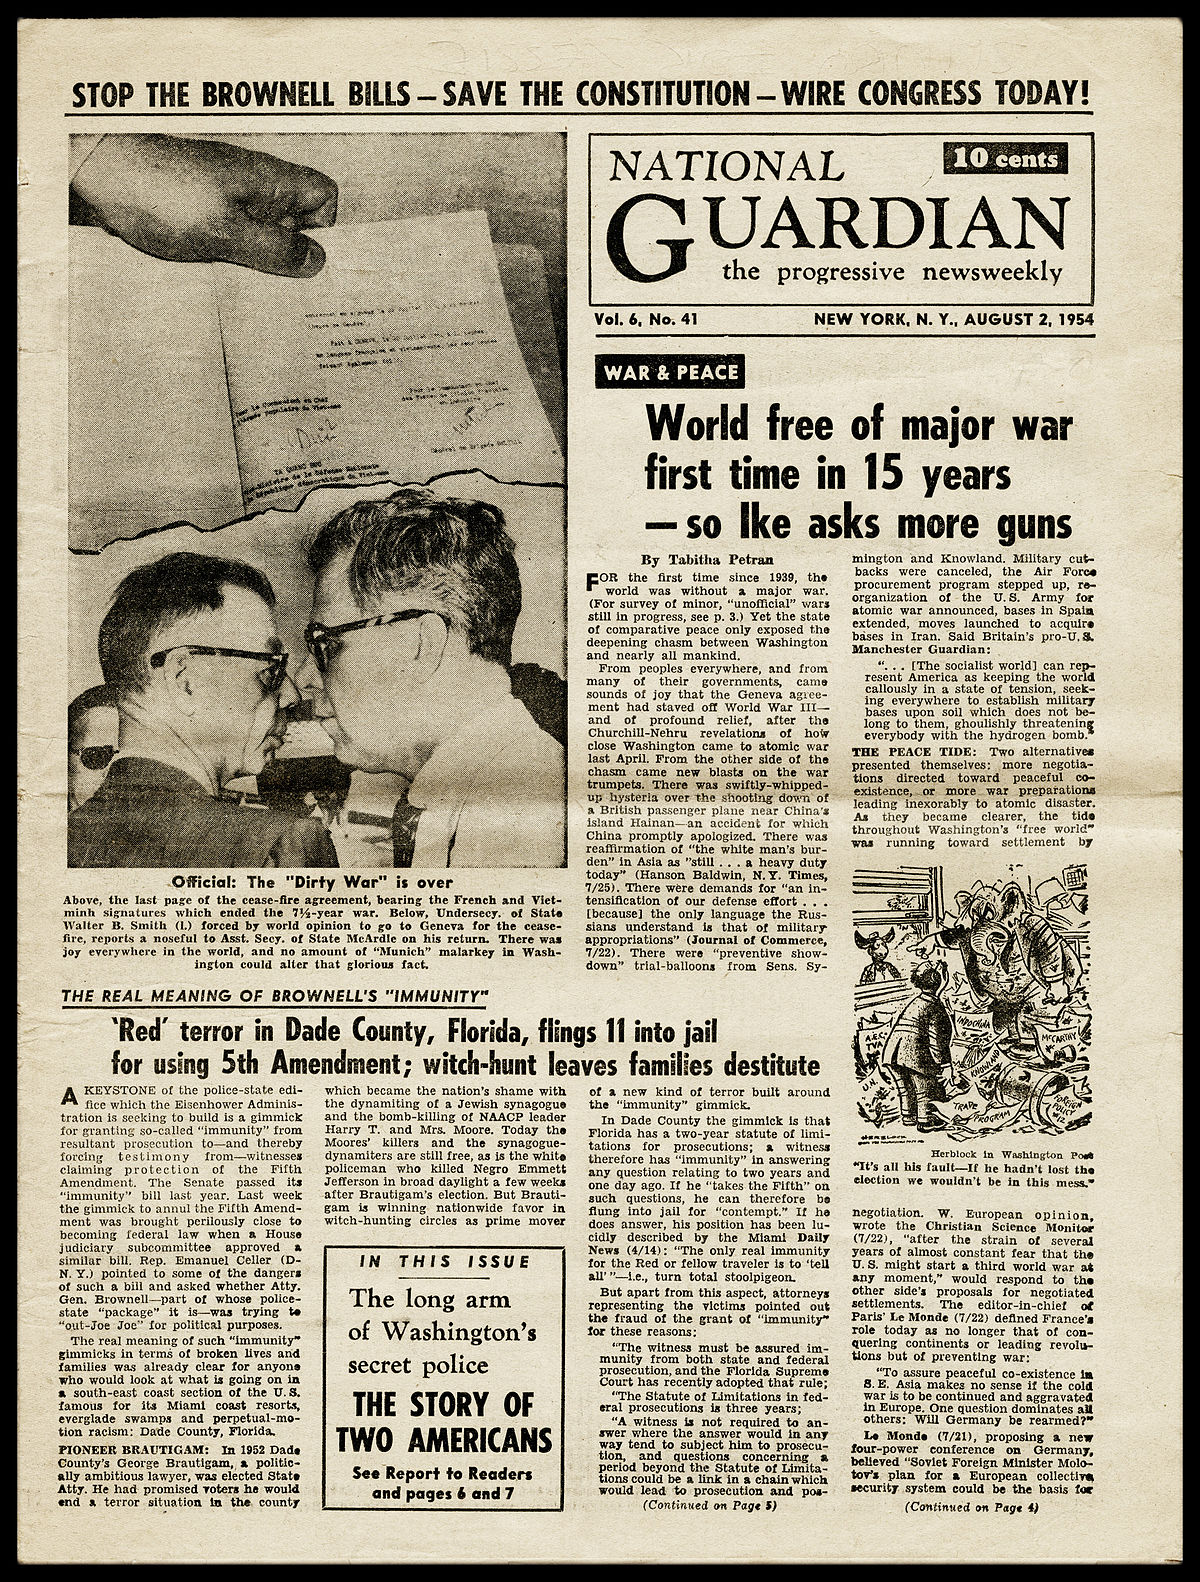 National Guardian - Wi...